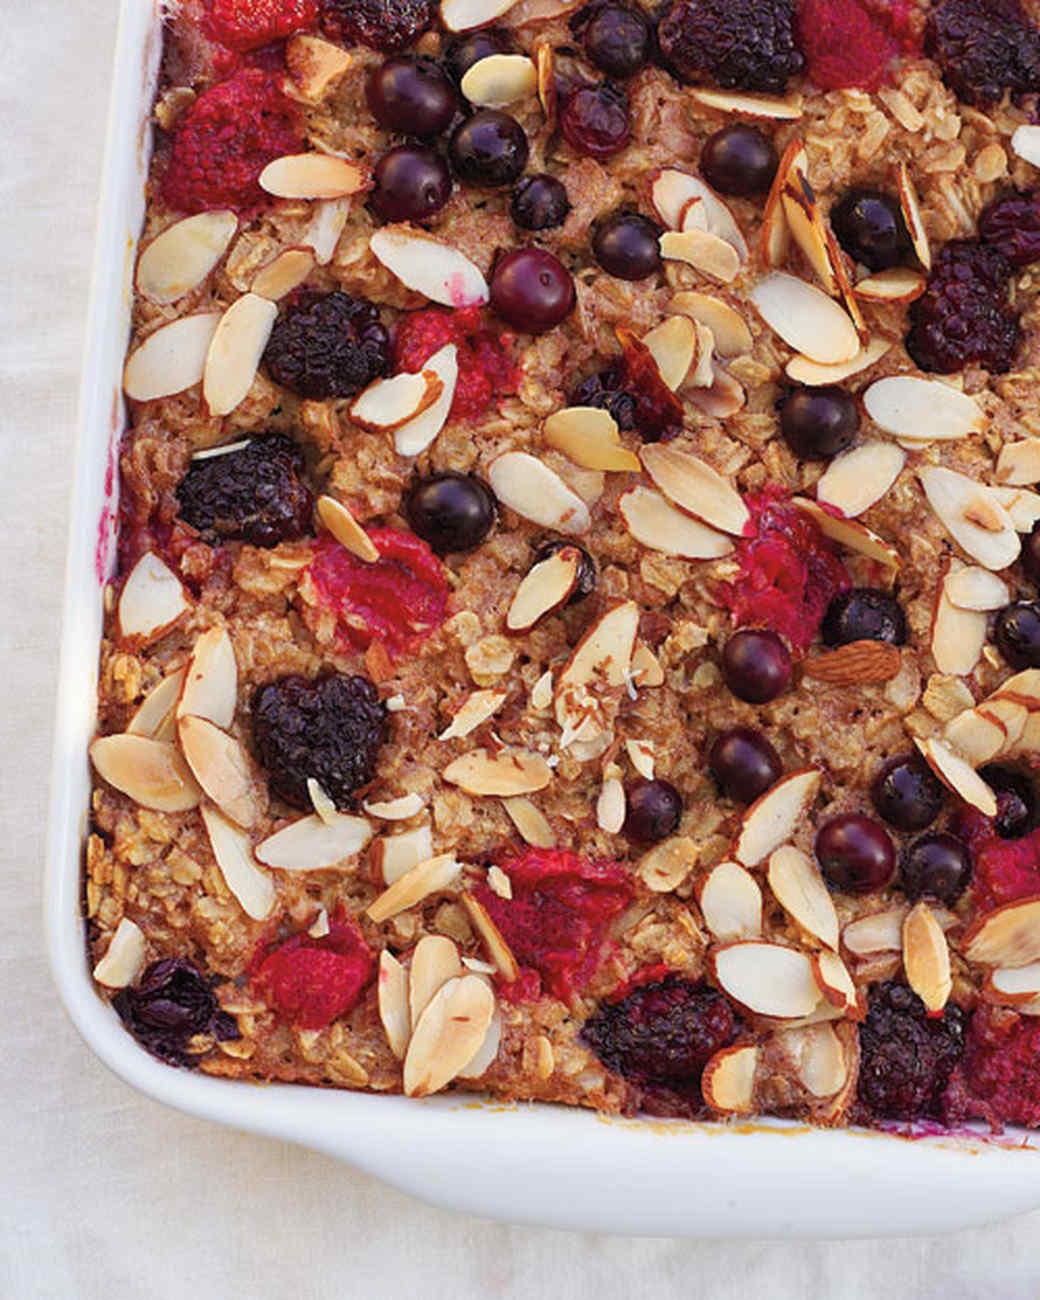 baked-oatmeal-0511MBD107098.jpg